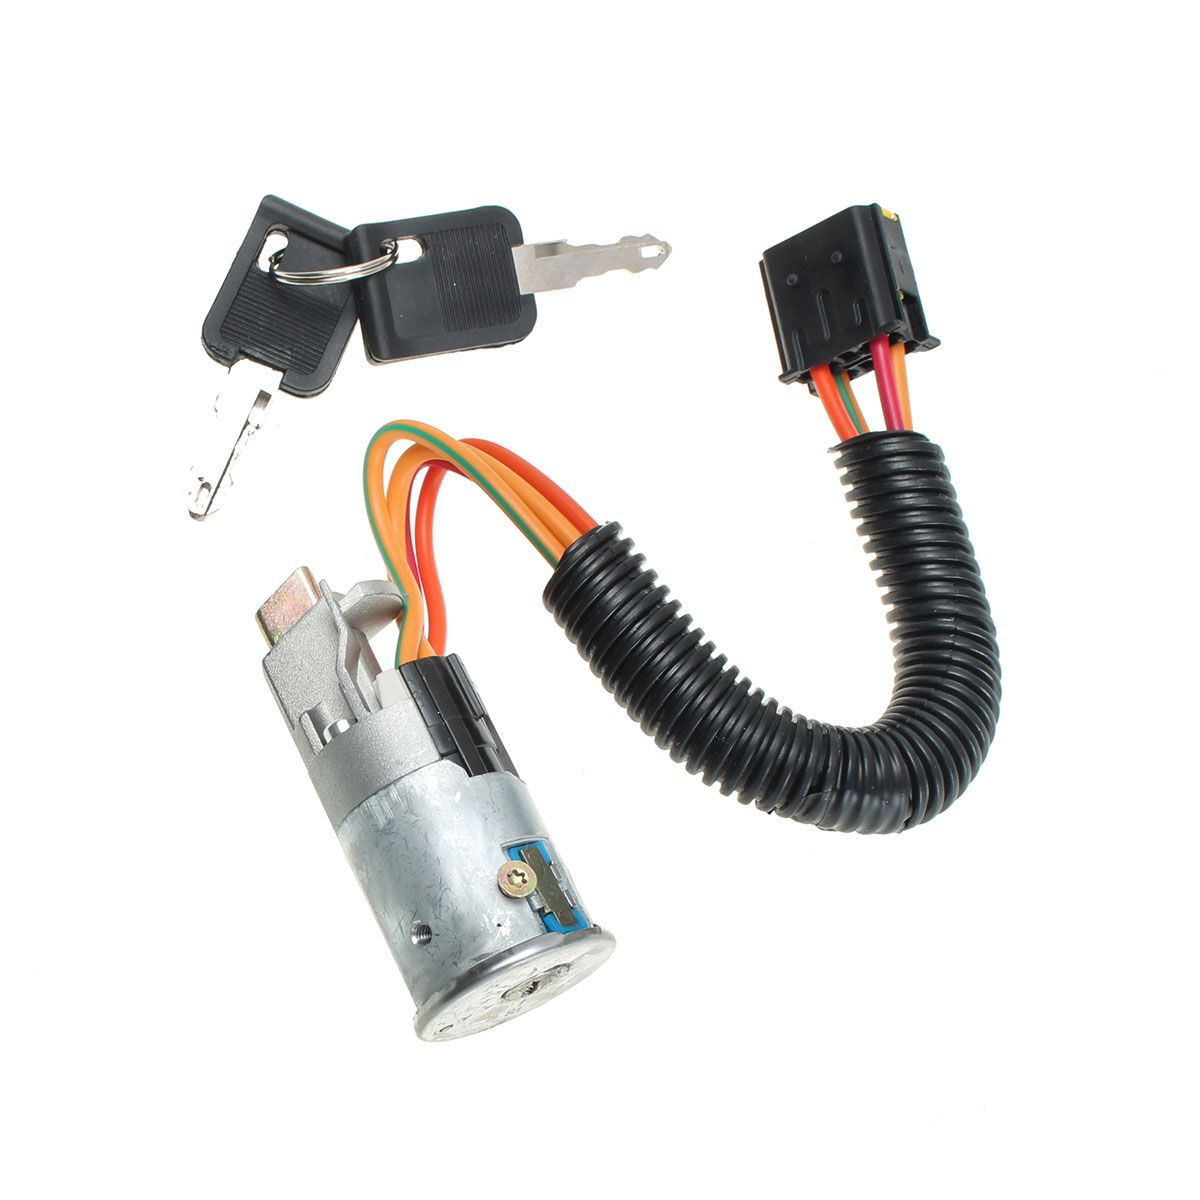 New Ignition Lock Switch Barrel + 2 Keys For RENAULT 1998-2005 /CLIO /MK2 /MEGANE /SCENIC